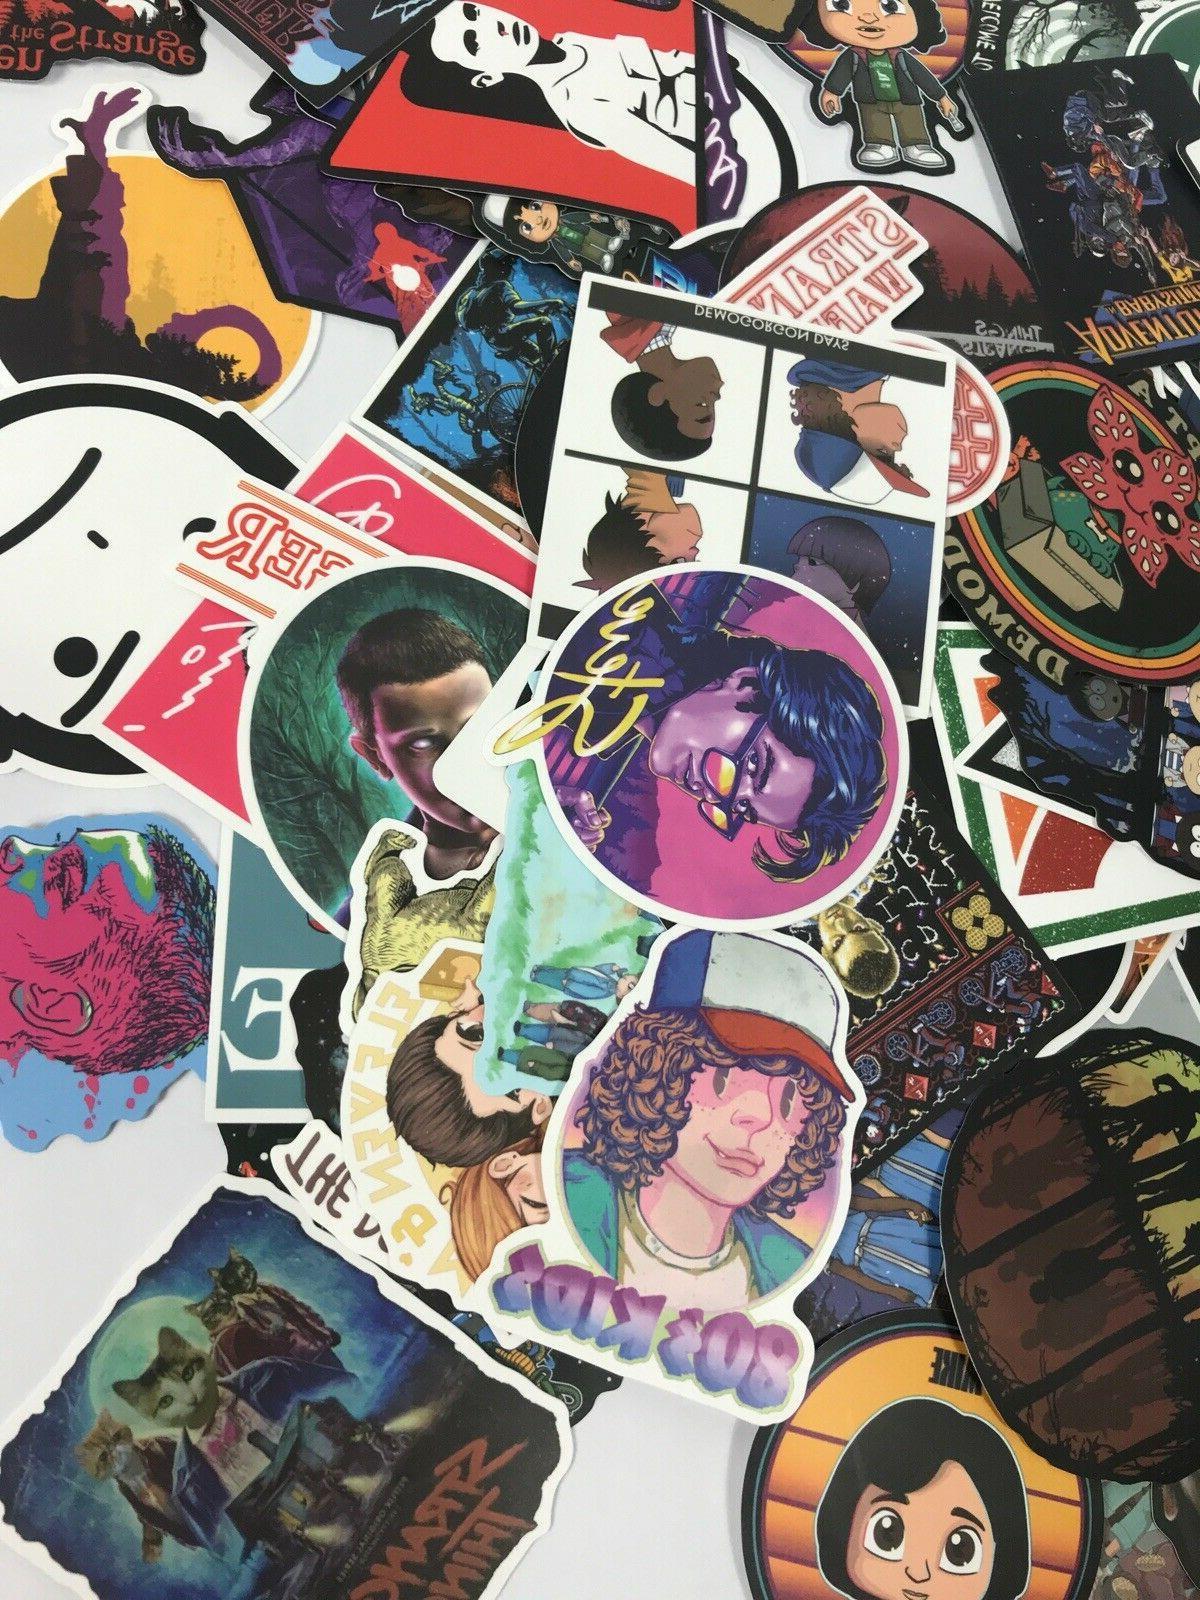 100pc Show Alien Decal Sticker Pack